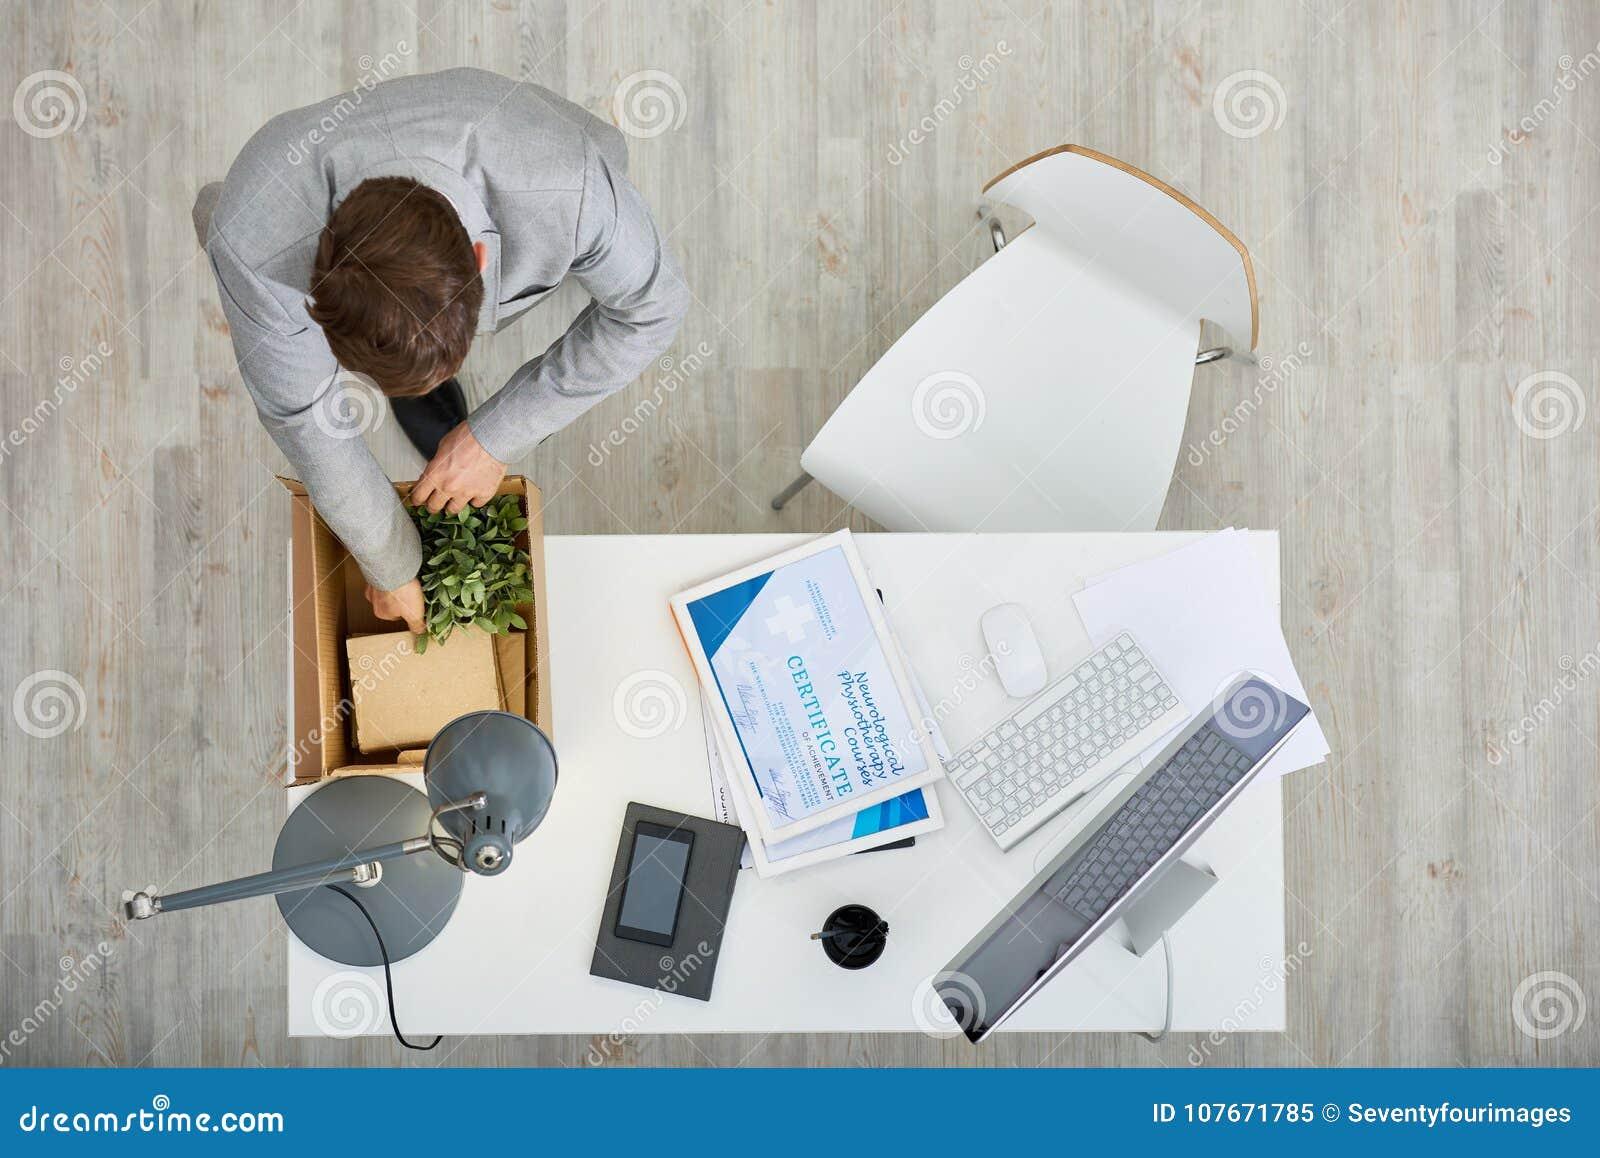 I lost my job stock image. Image of dismissal, businessman - 107671785